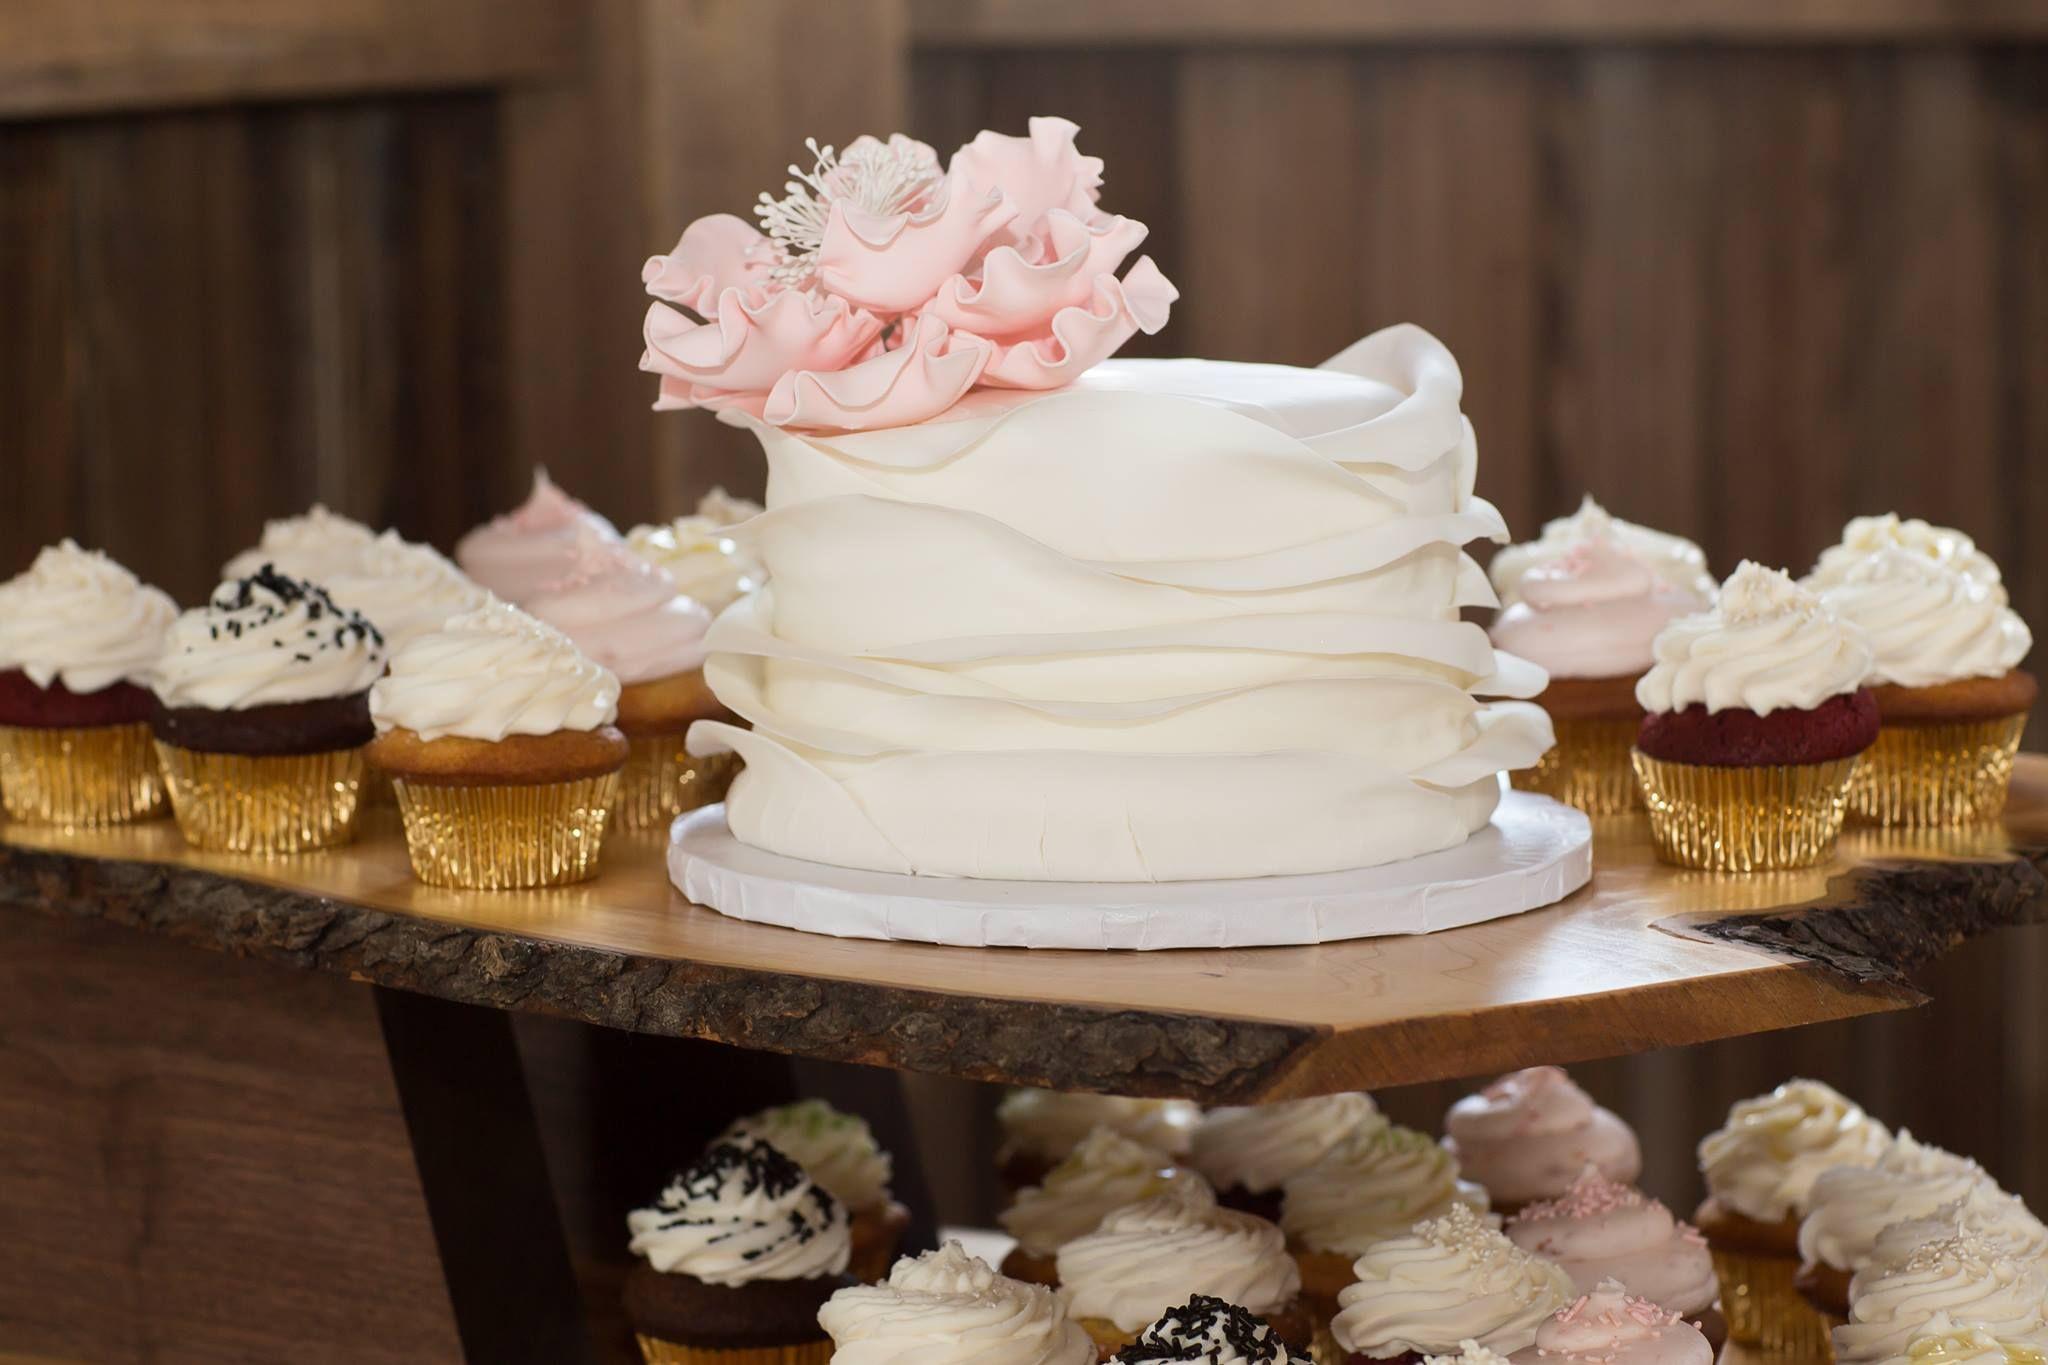 #wedding #weddingcake #weddingphotography #videoexpressproductions